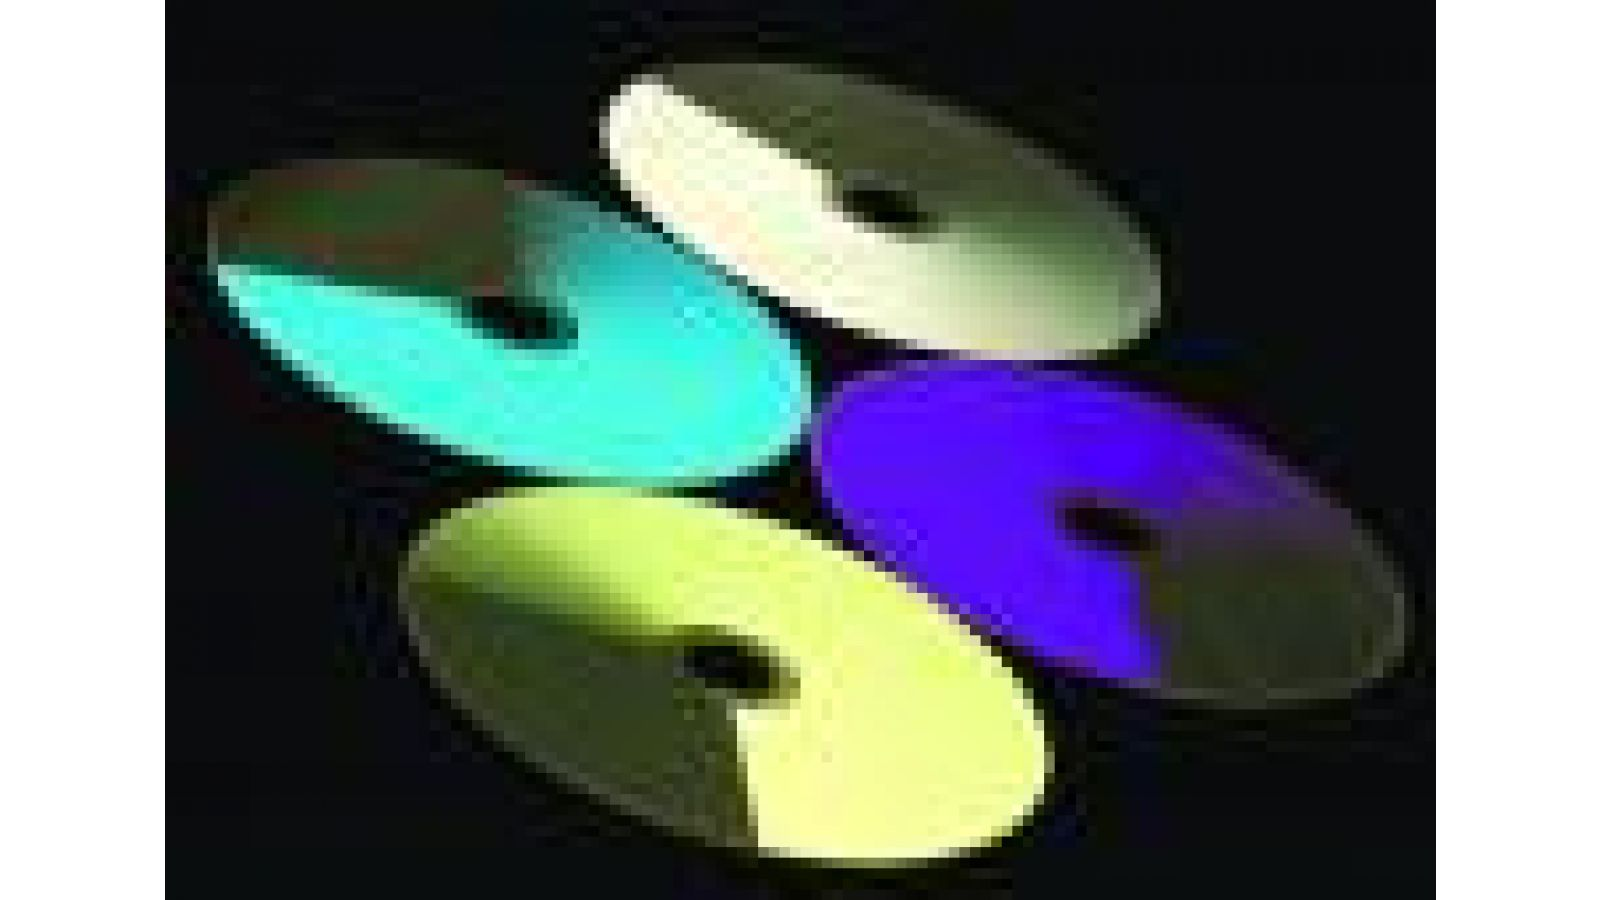 Dichroic Filter Arrays